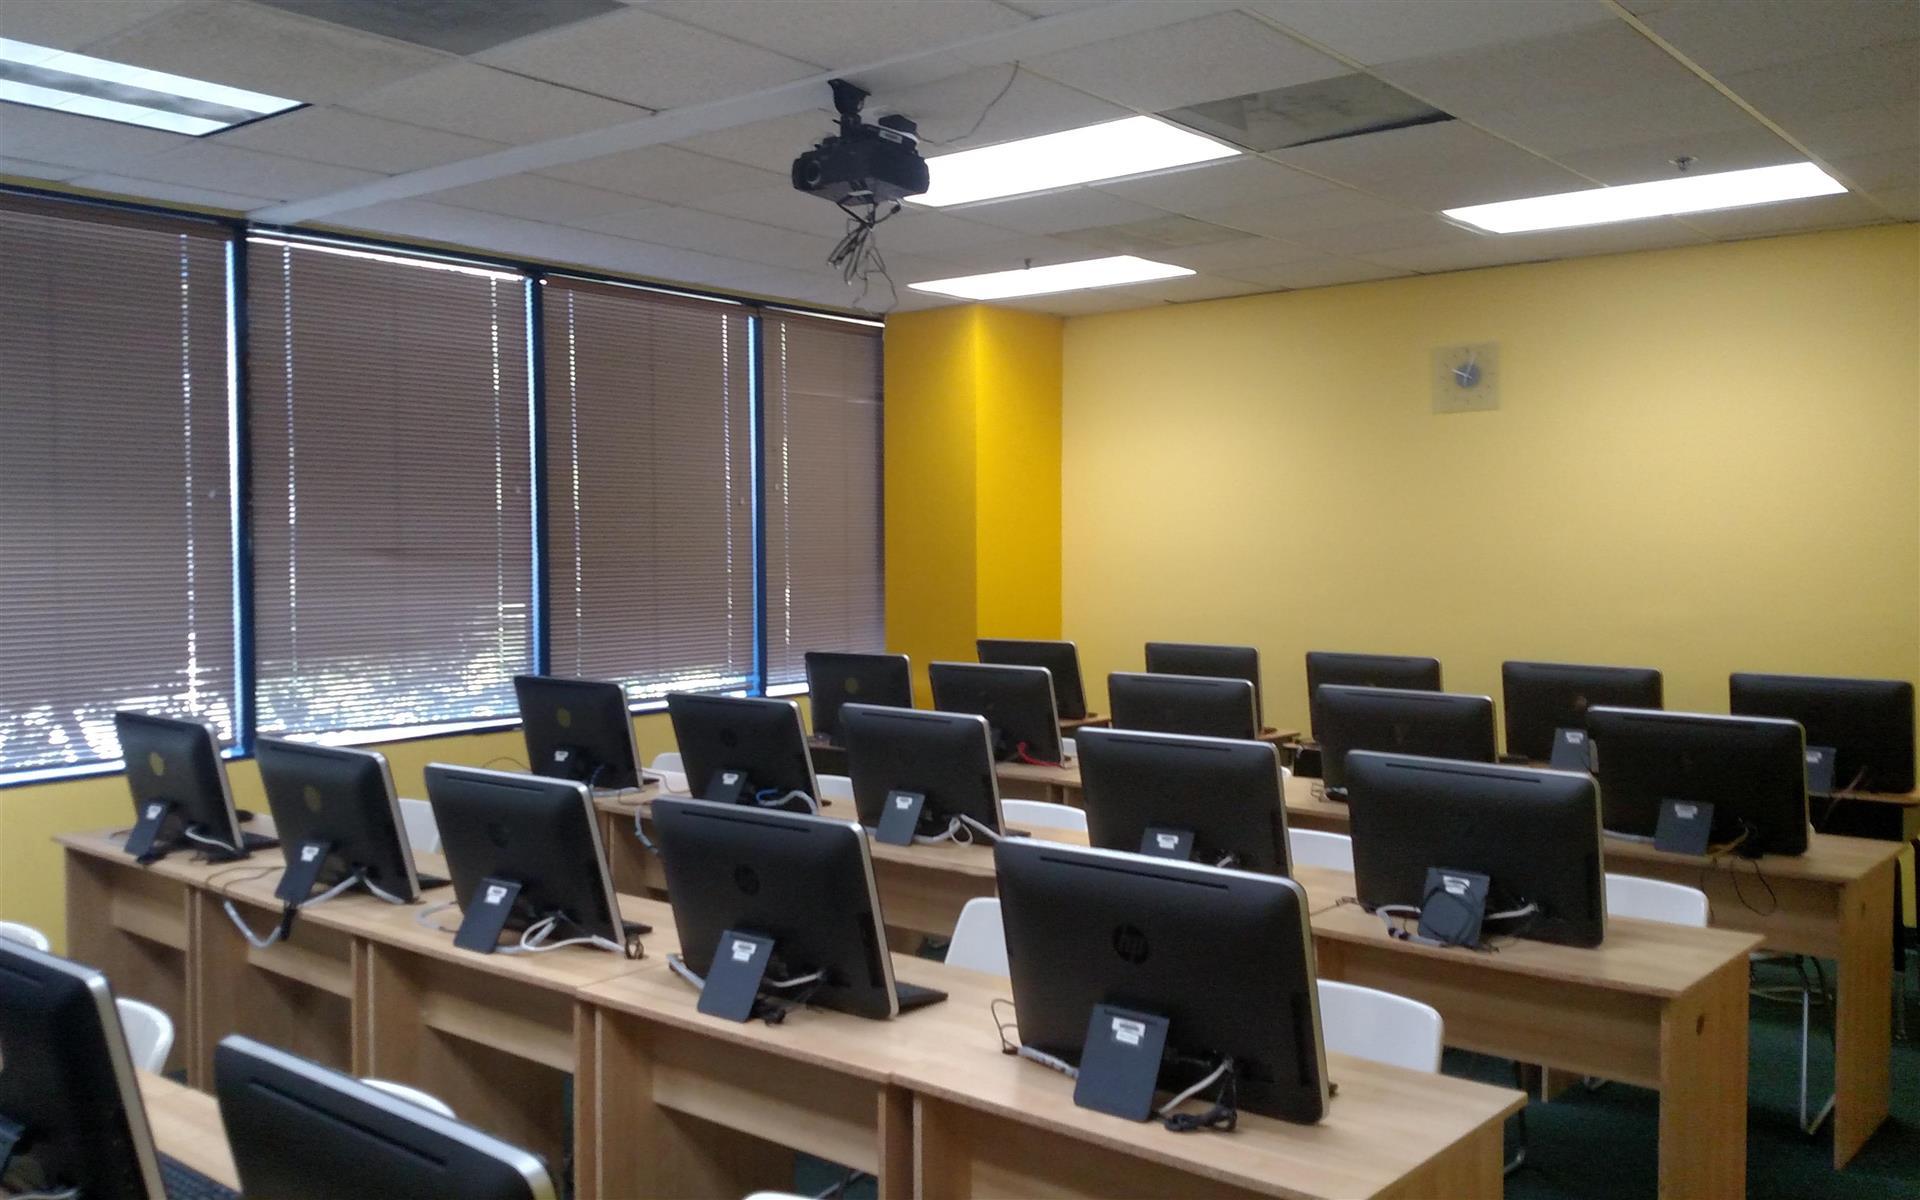 Learnet Academy, Inc. - Computer Classroom 2